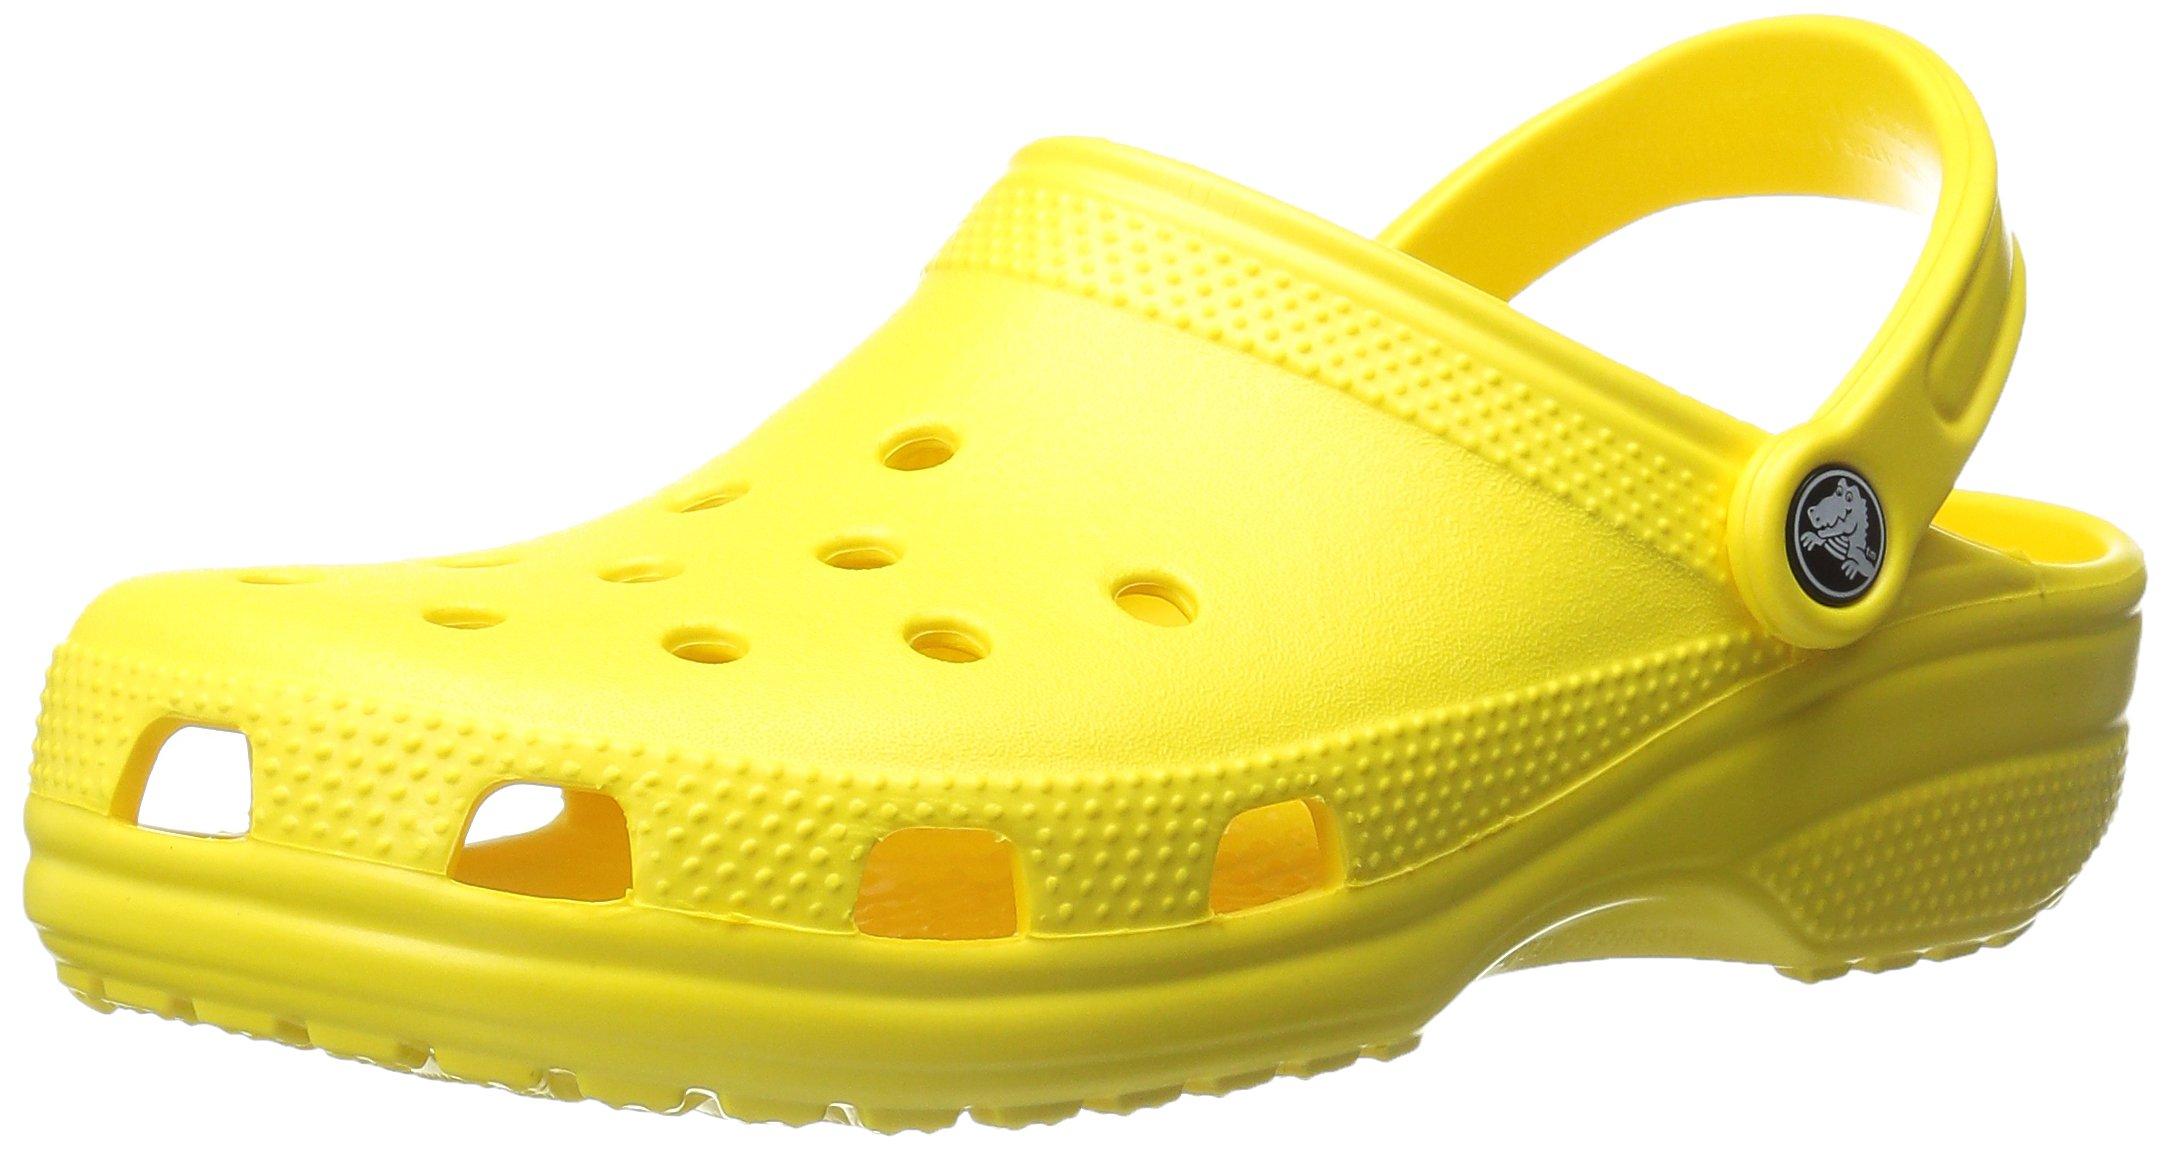 Crocs Men's and Women's Classic Casual Comfort Slip On Clog, Lightweight Water Shoe